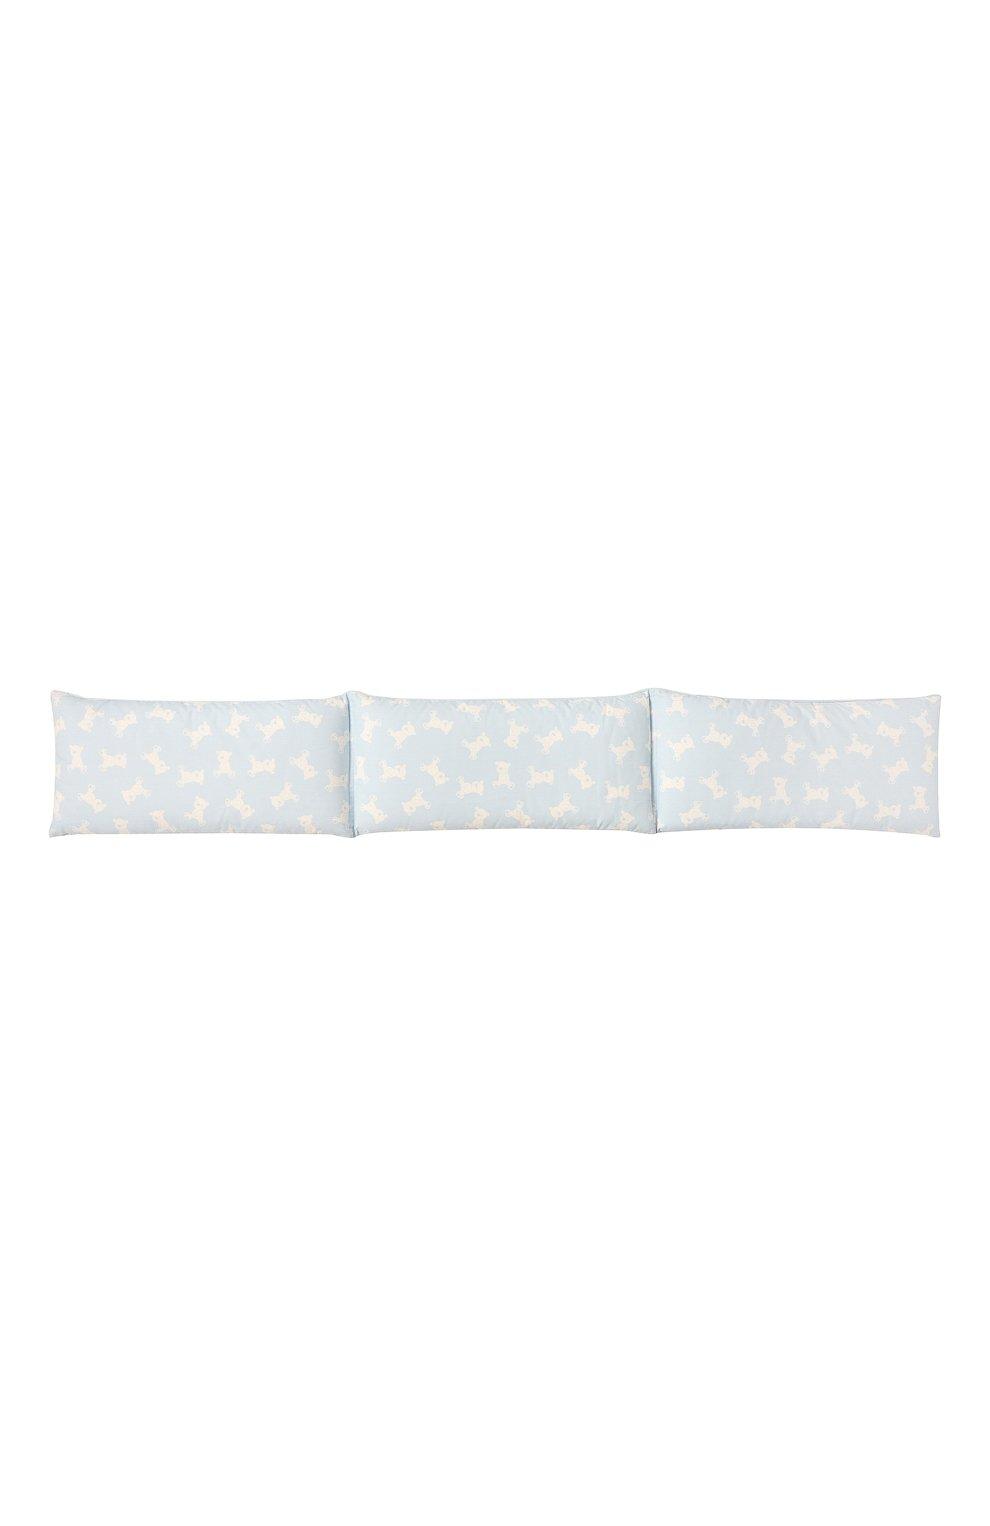 Детского комплект для кровати A&A BABY GLAM голубого цвета, арт. M7 BL 0301 12565 4 | Фото 6